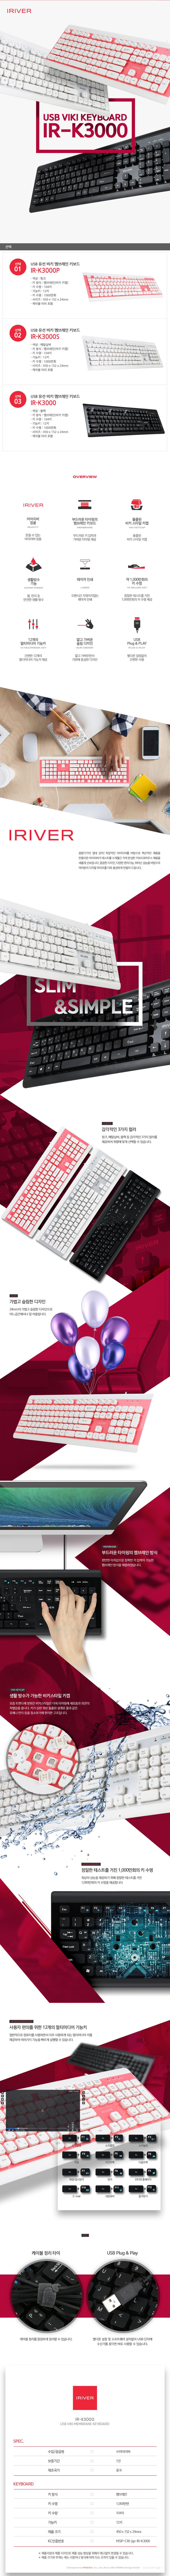 GT 아이리버 유선키보드 IR-K3000B 블랙 키보드 유선키보드 컴퓨터키보드 PC키보드 가정용키보드 학교키보드 사무실키보드 사무용키보드 회사키보드 가정용유선키보드